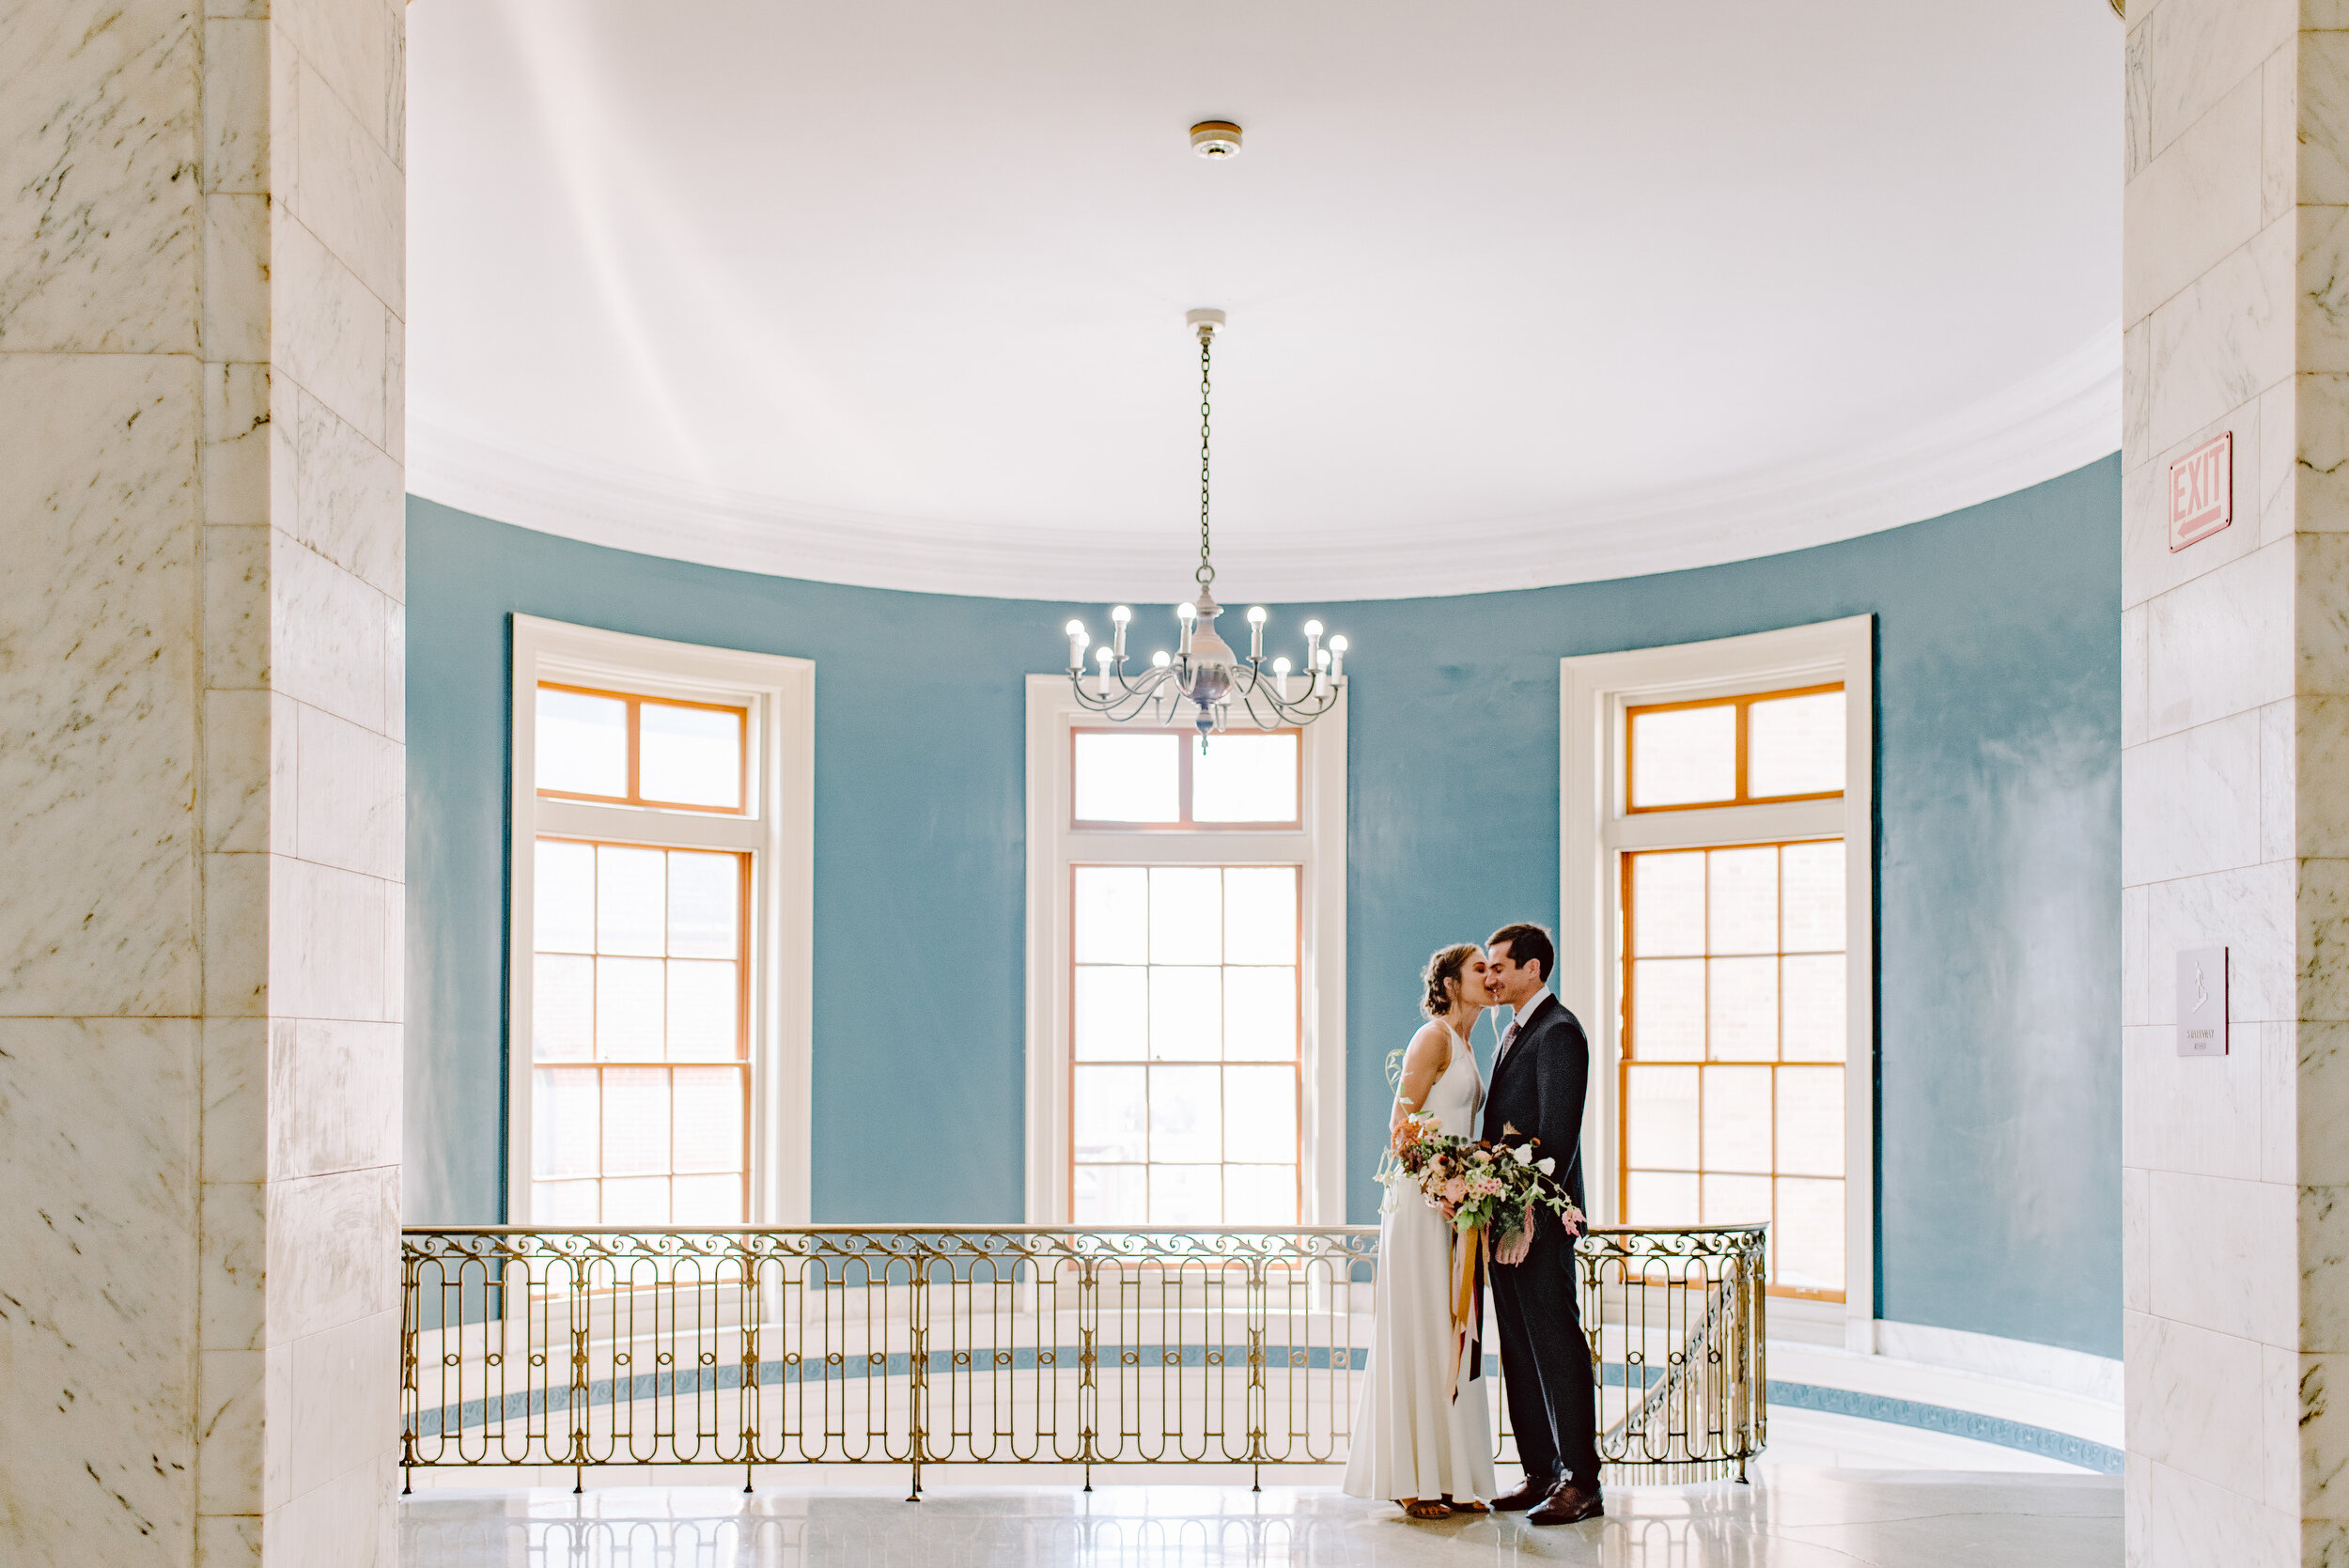 classy portland maine wedding venue photo of bride and groom inside